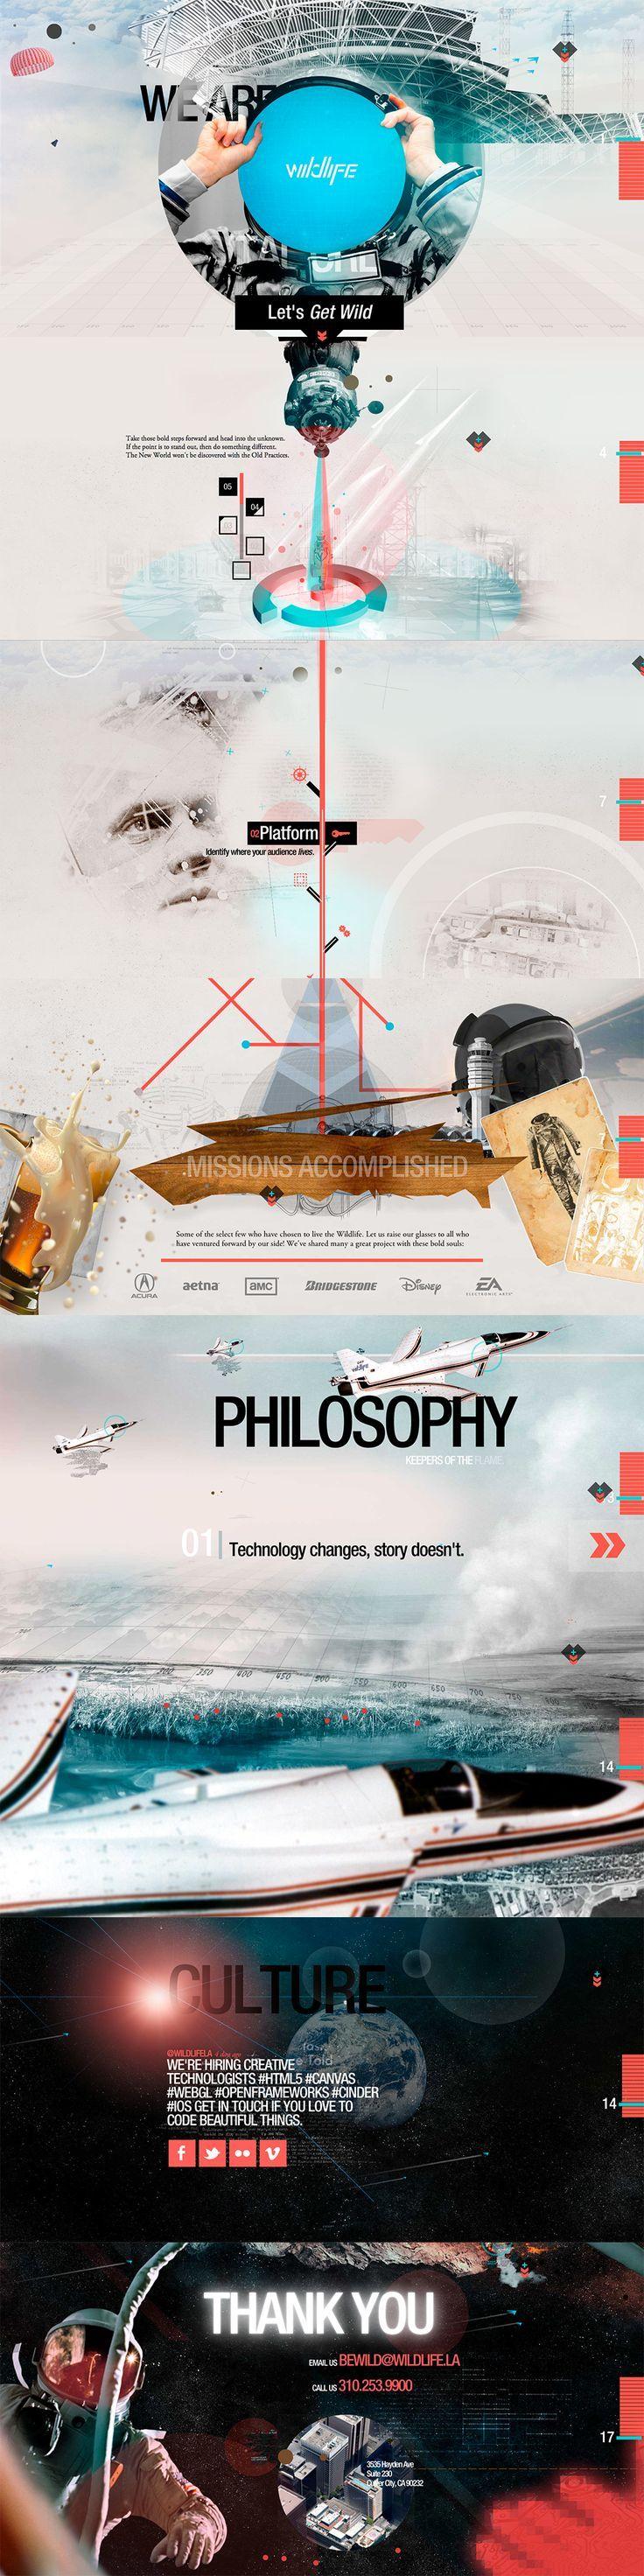 wildlife web design